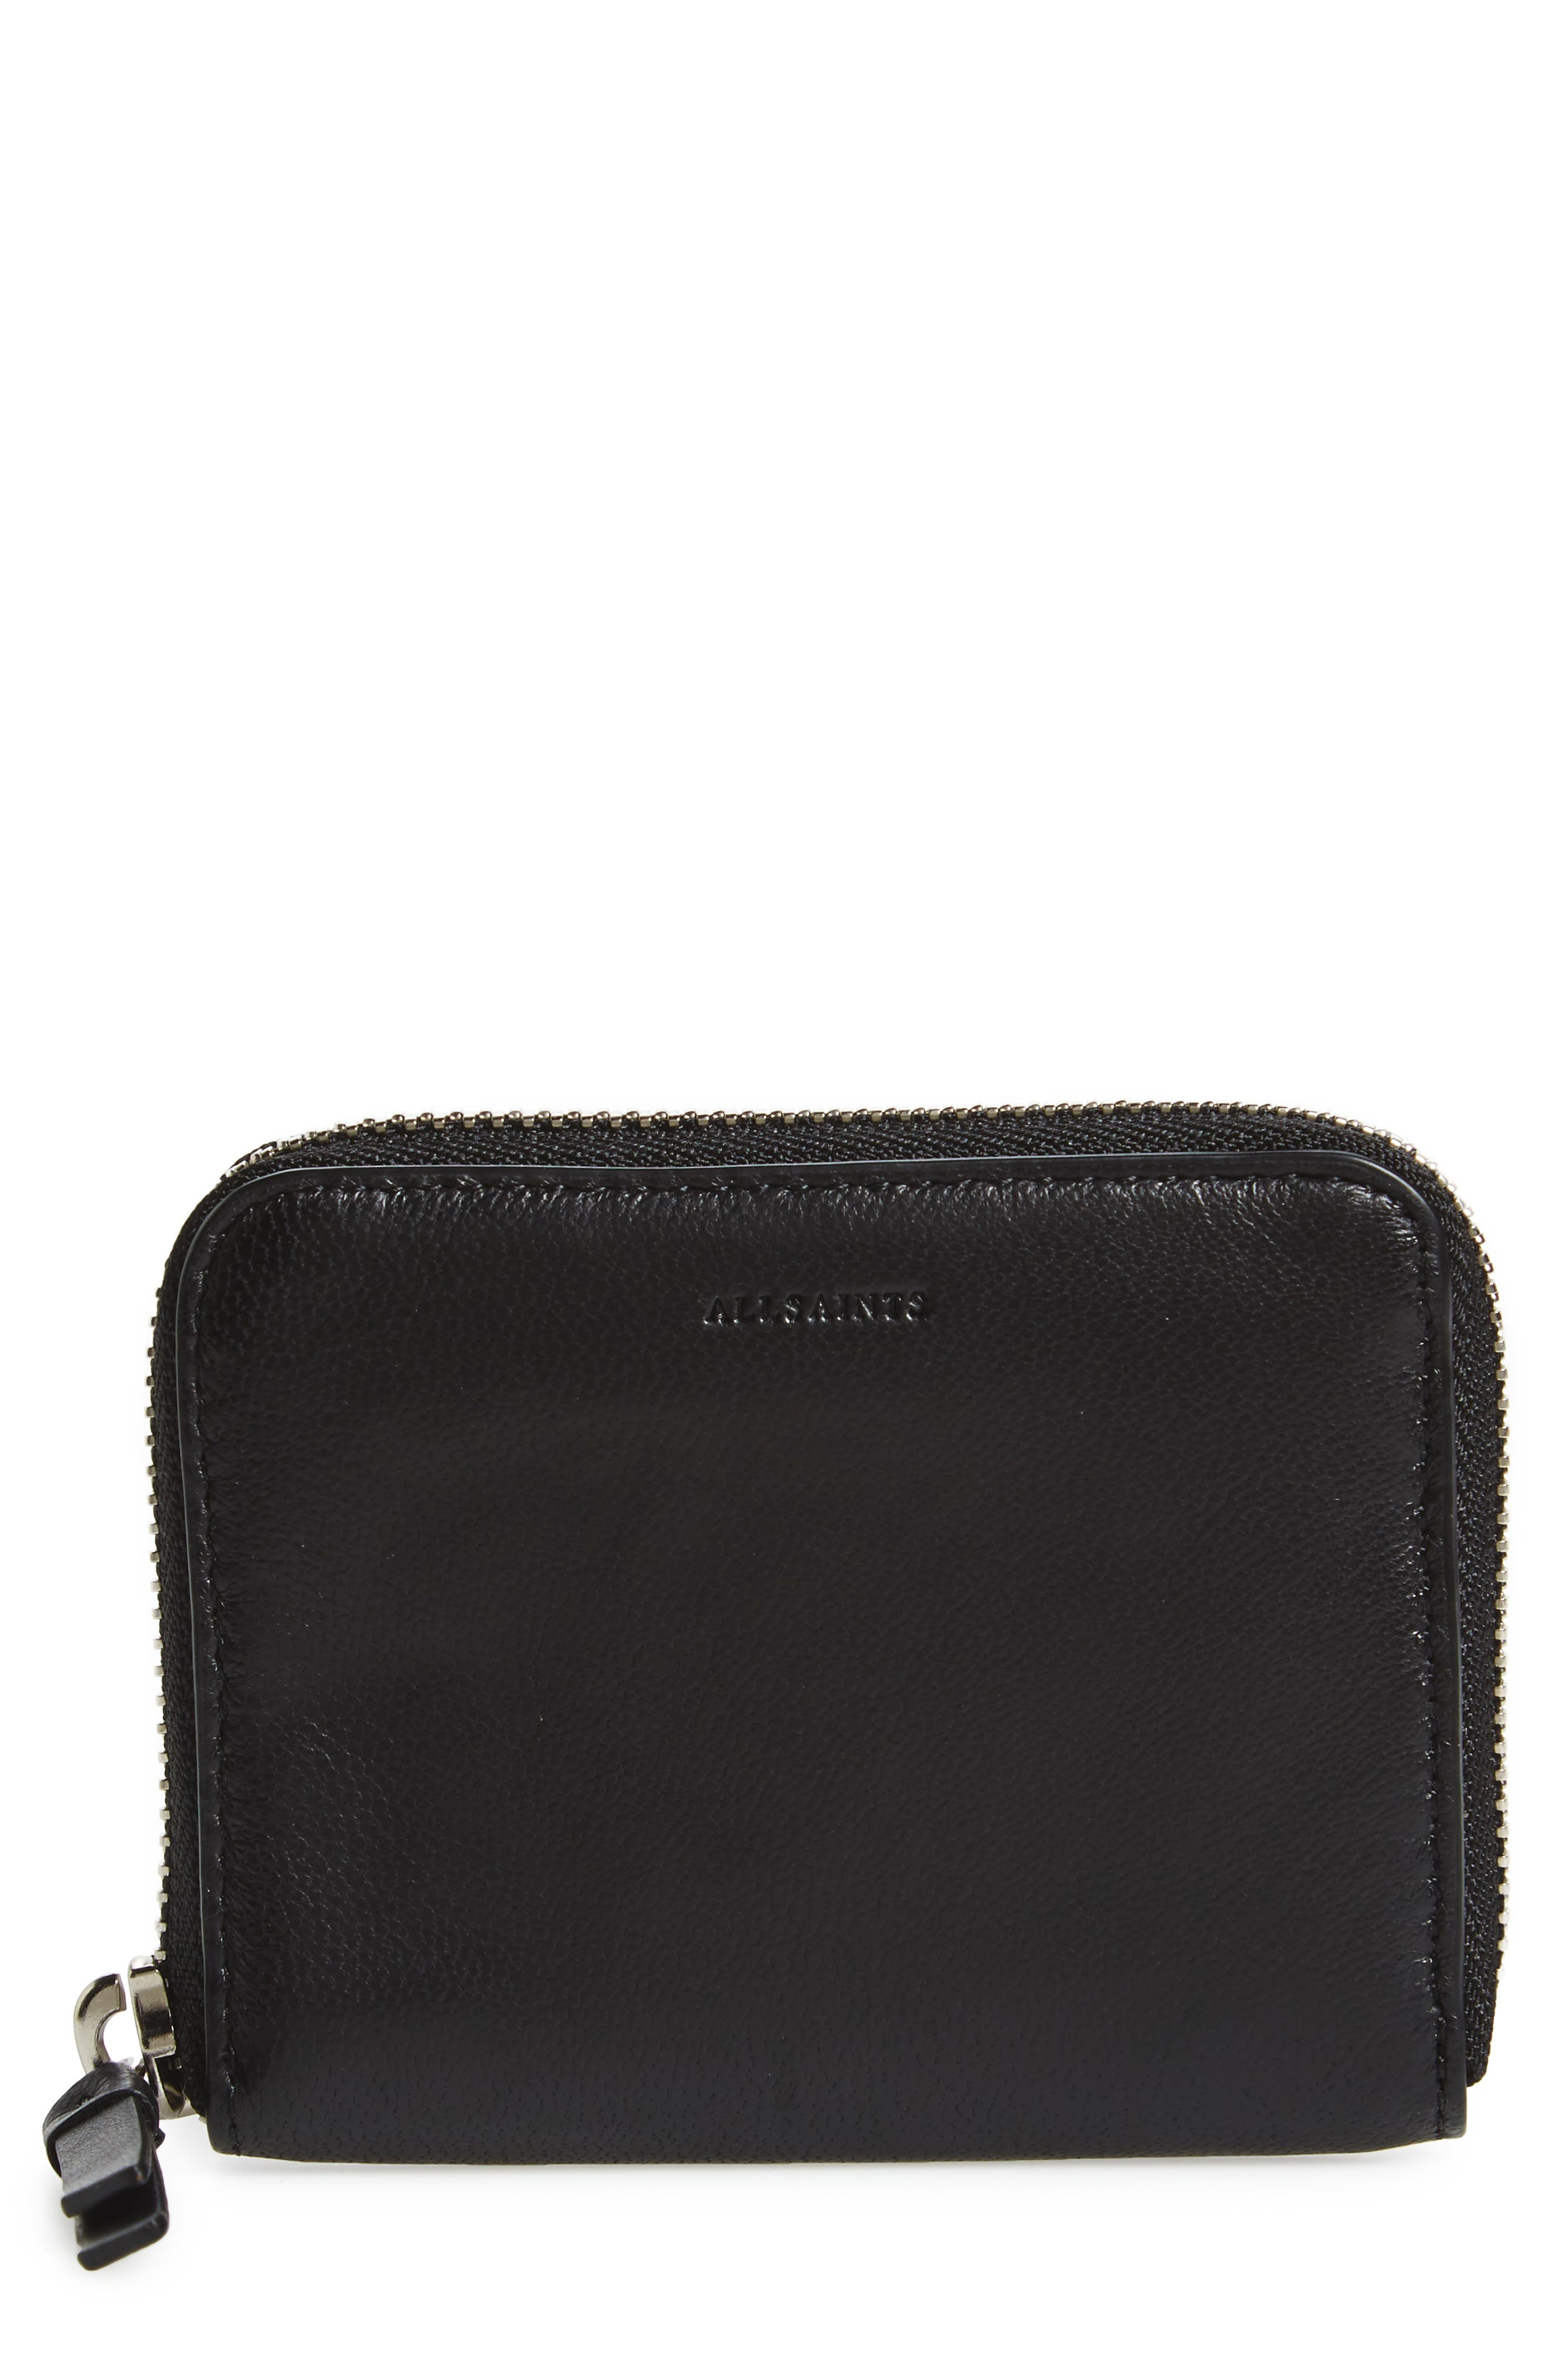 Kanda Mini Zip Wallet,                             Main thumbnail 1, color,                             Black